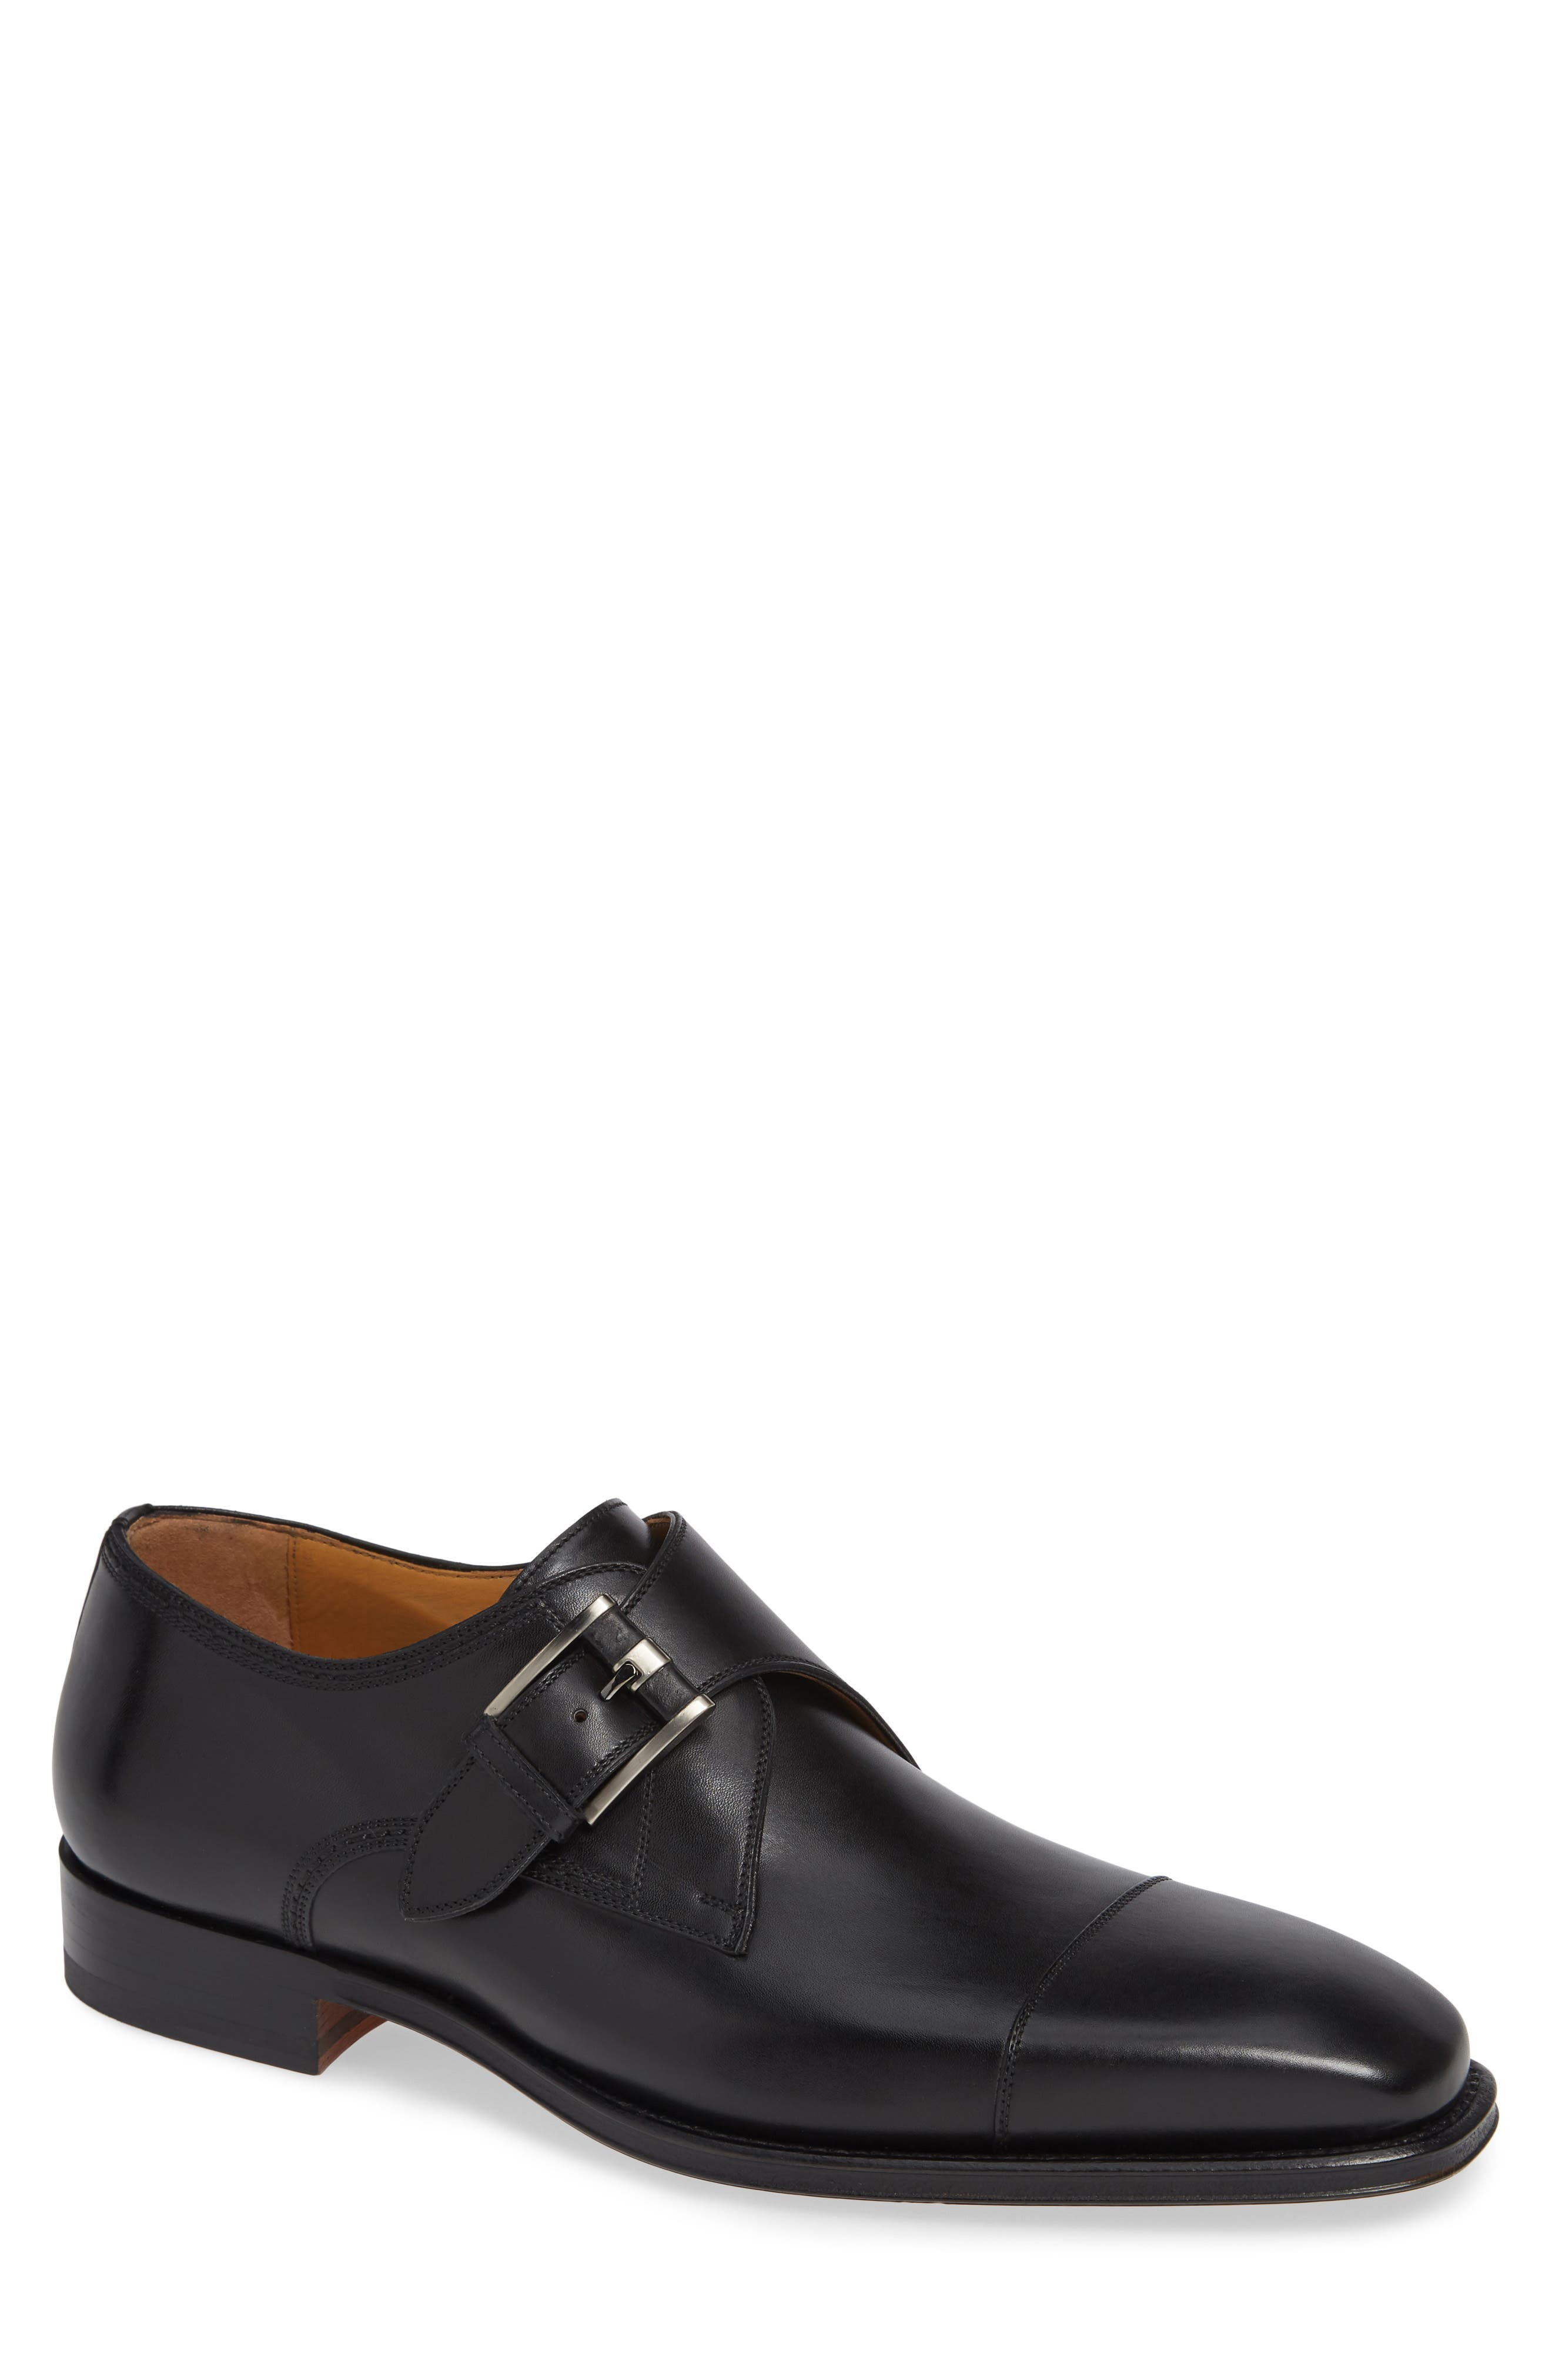 Lennon Monk Strap Shoe,                             Main thumbnail 1, color,                             001